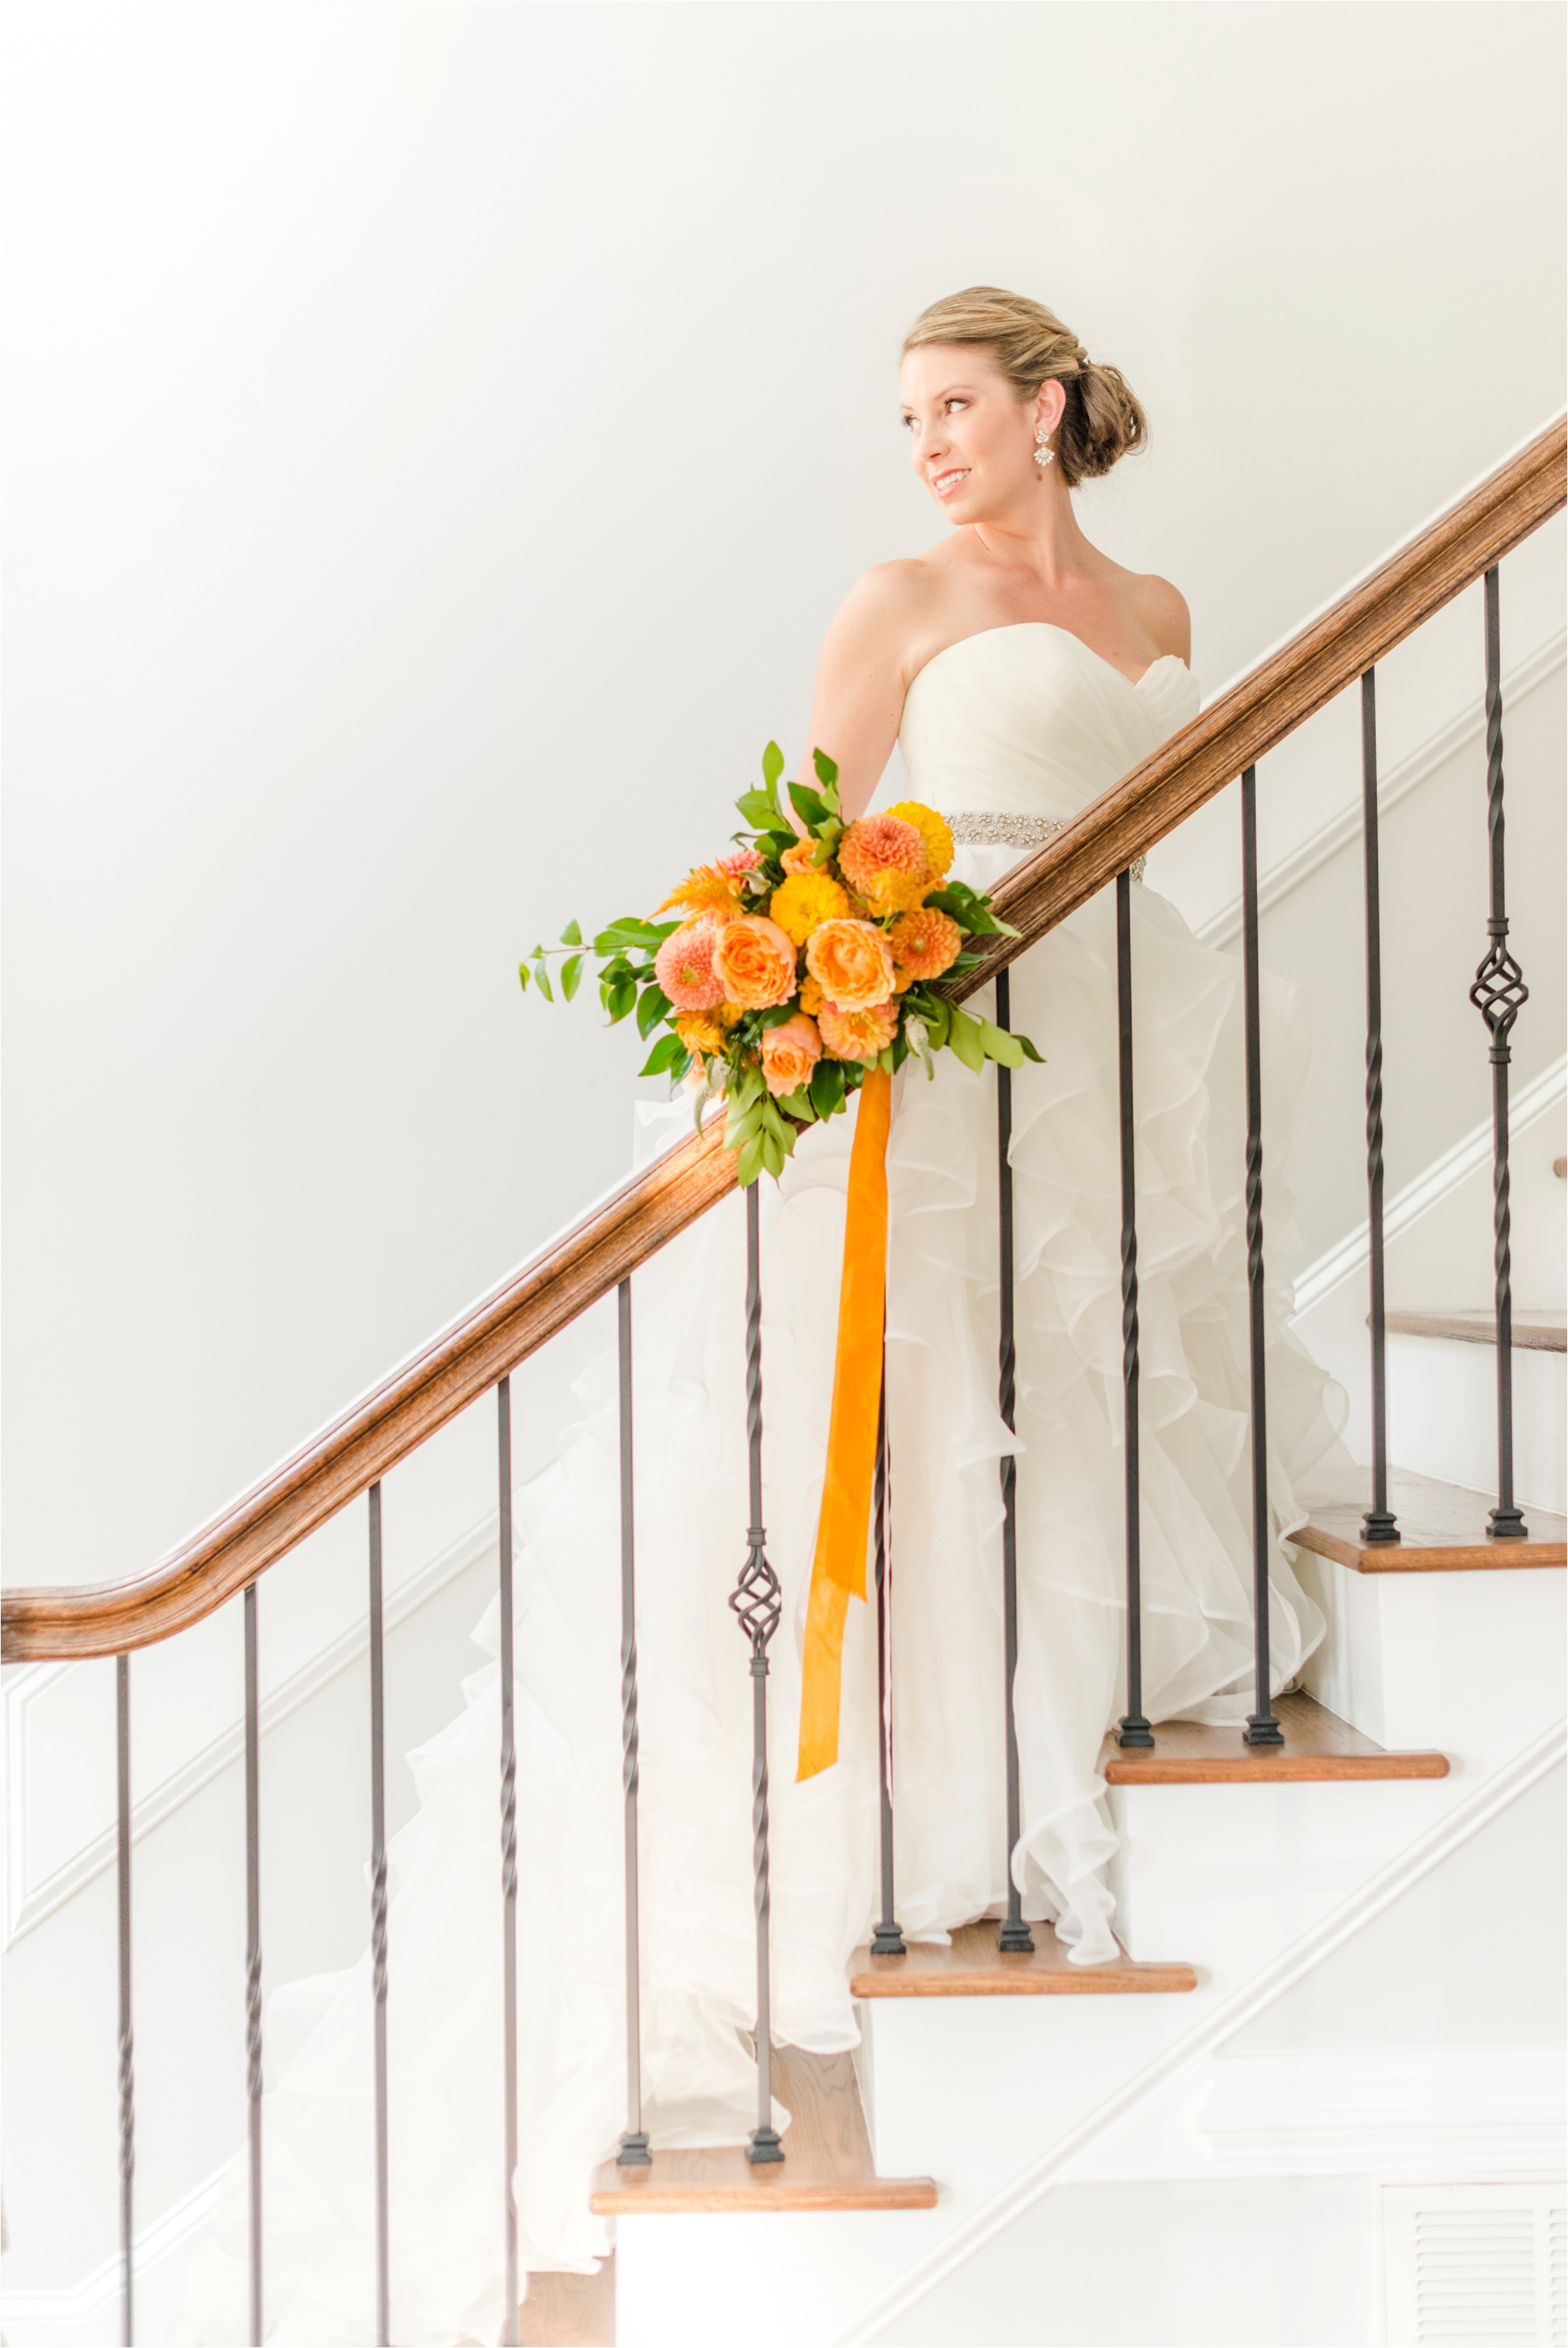 Classic Bridal Portrait Raleigh North Carolina Wedding Photographer Jaclyn Auletta Photography